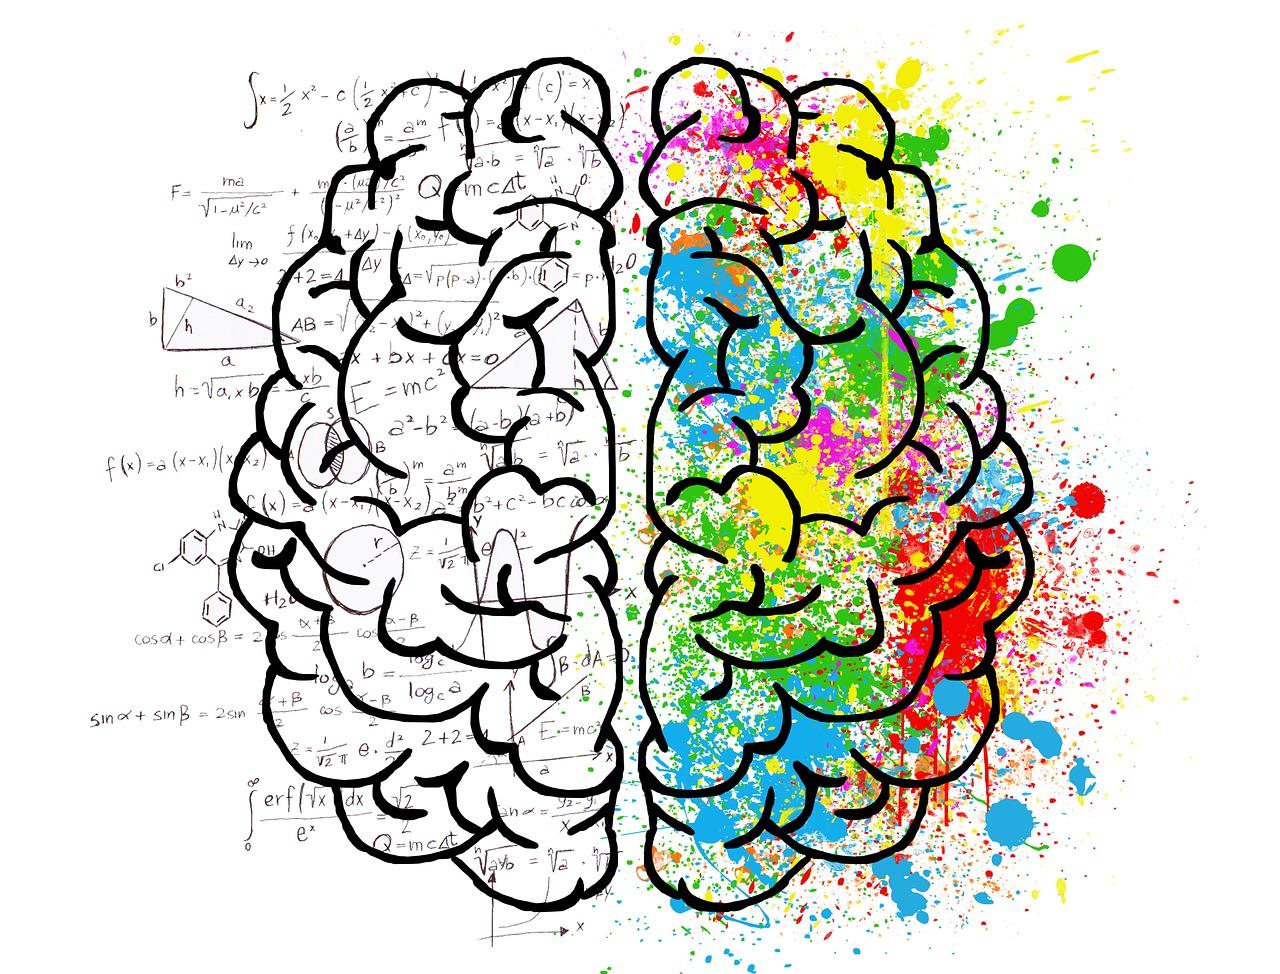 brain-2062057_1280_pixabay.jpg